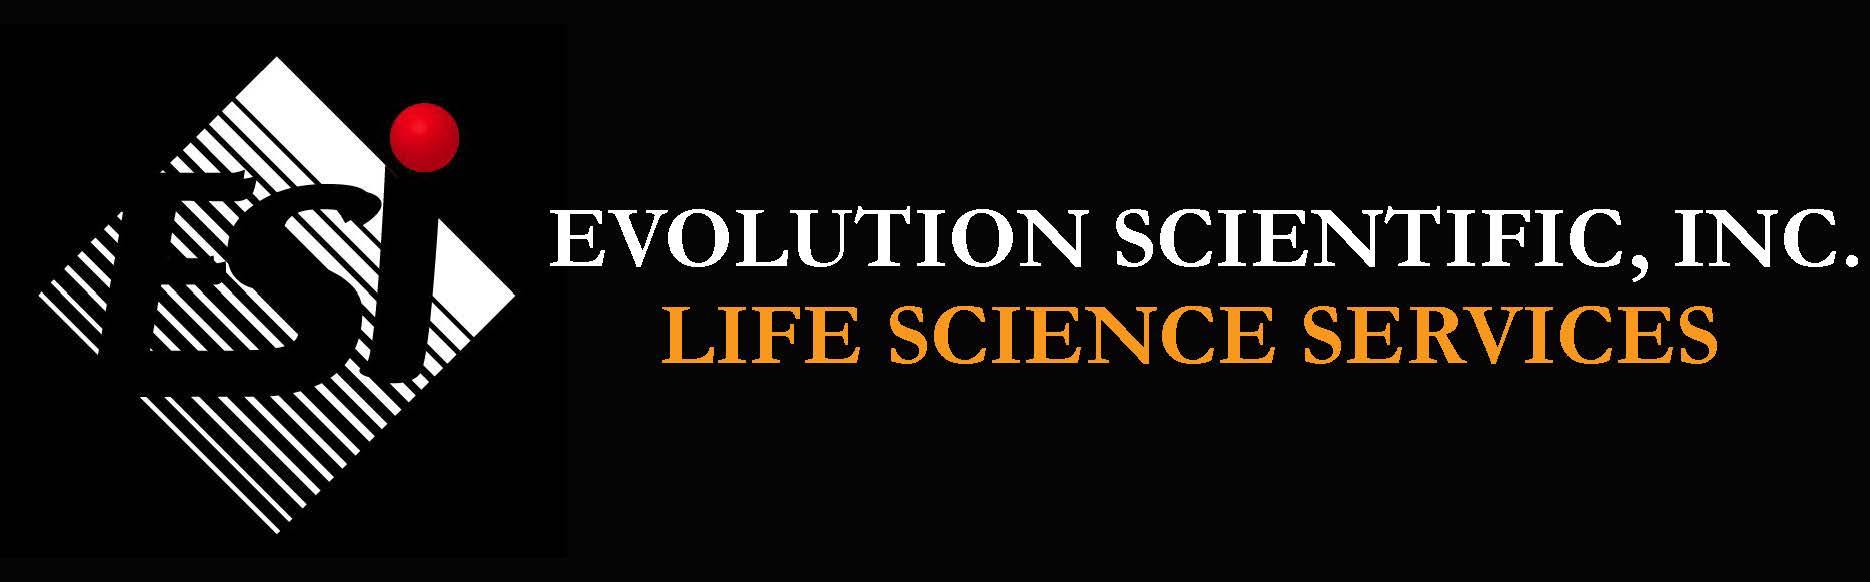 Evolution Scientific